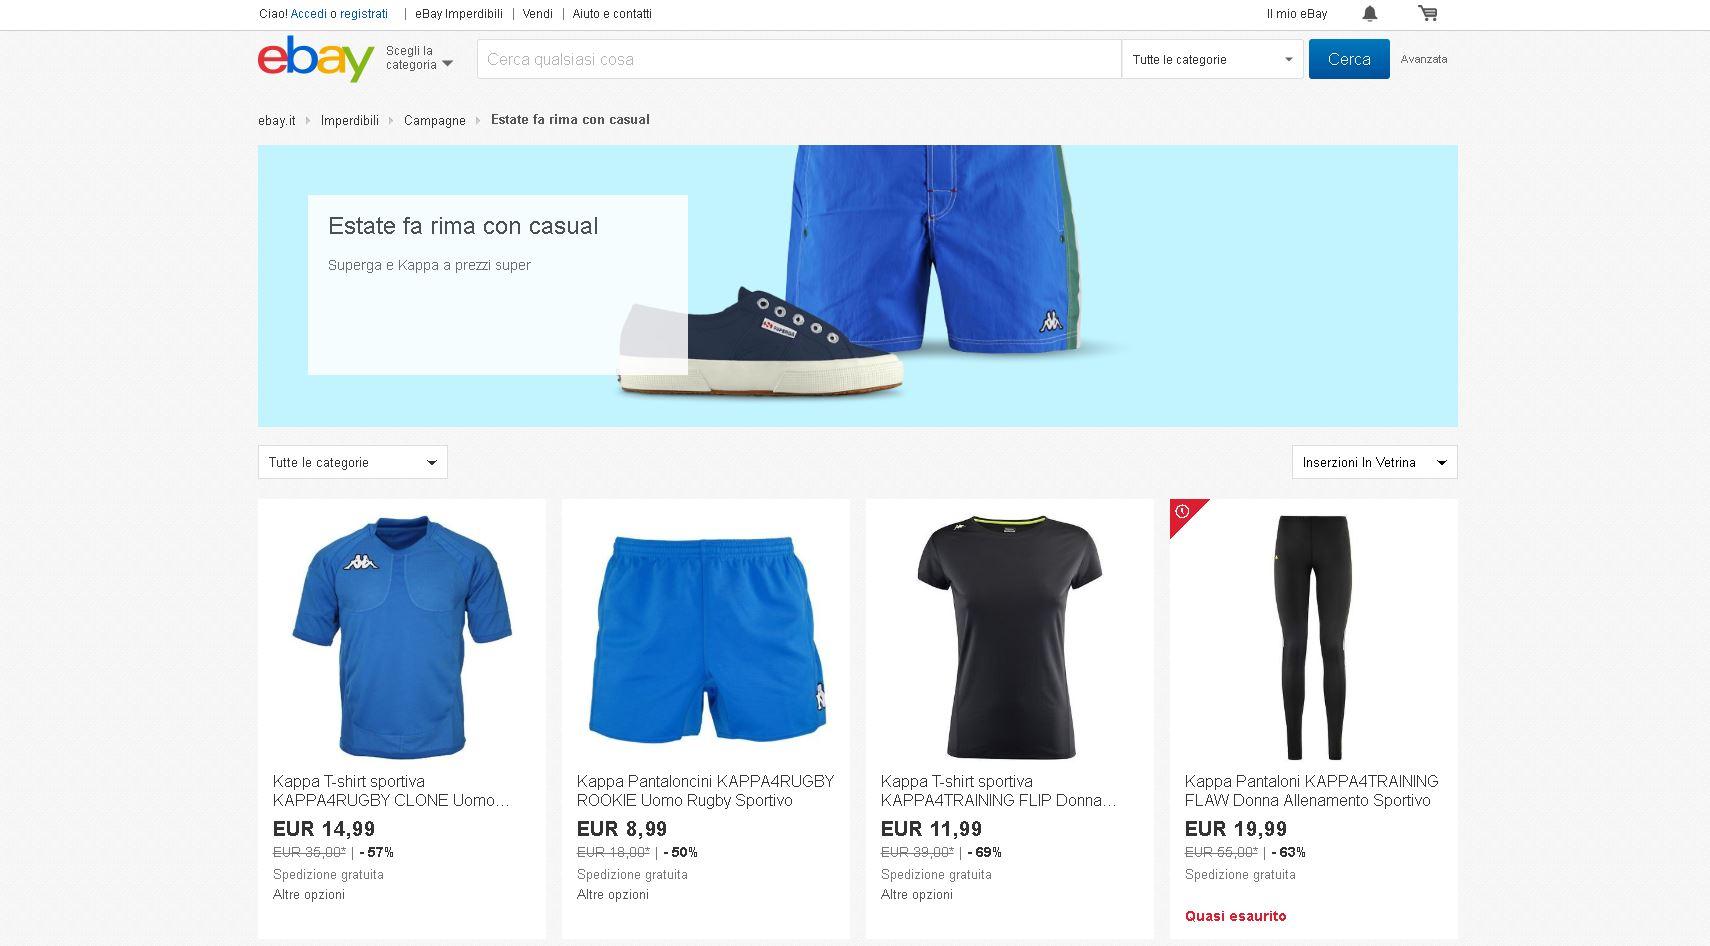 ebay kappa superga